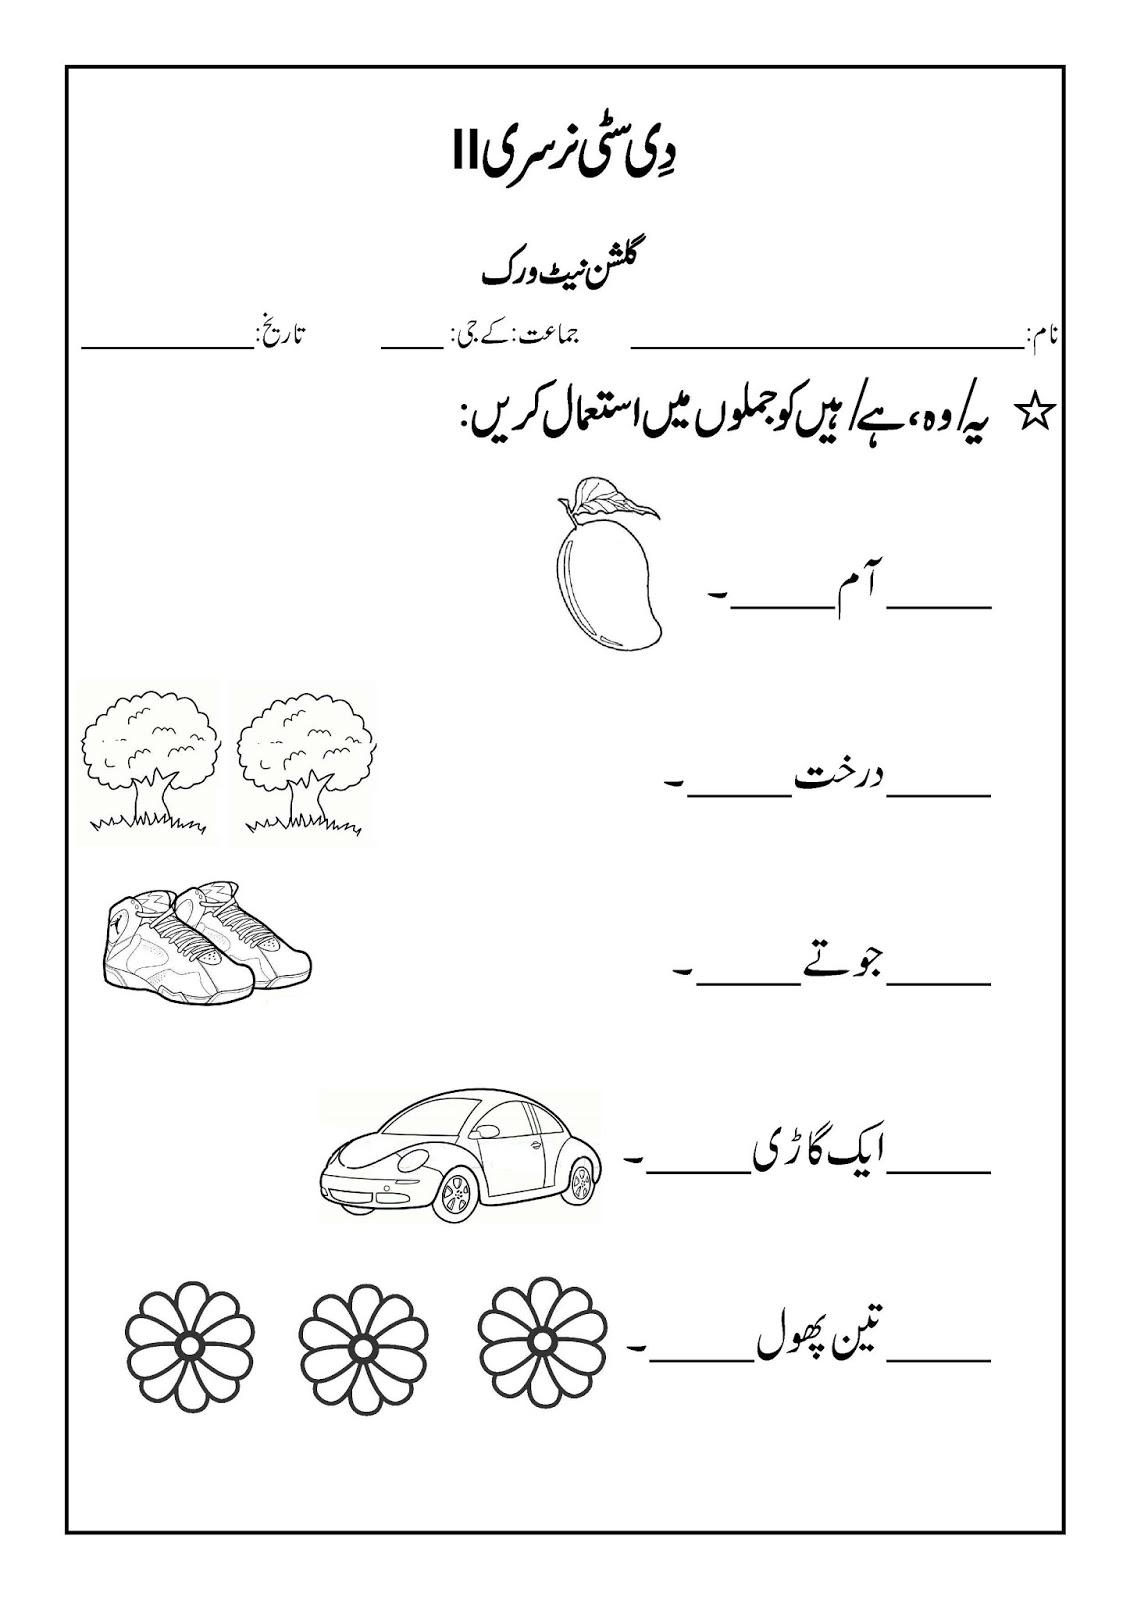 Worksheet For Class 2 Urdu   Printable Worksheets and Activities for  Teachers [ 1600 x 1130 Pixel ]